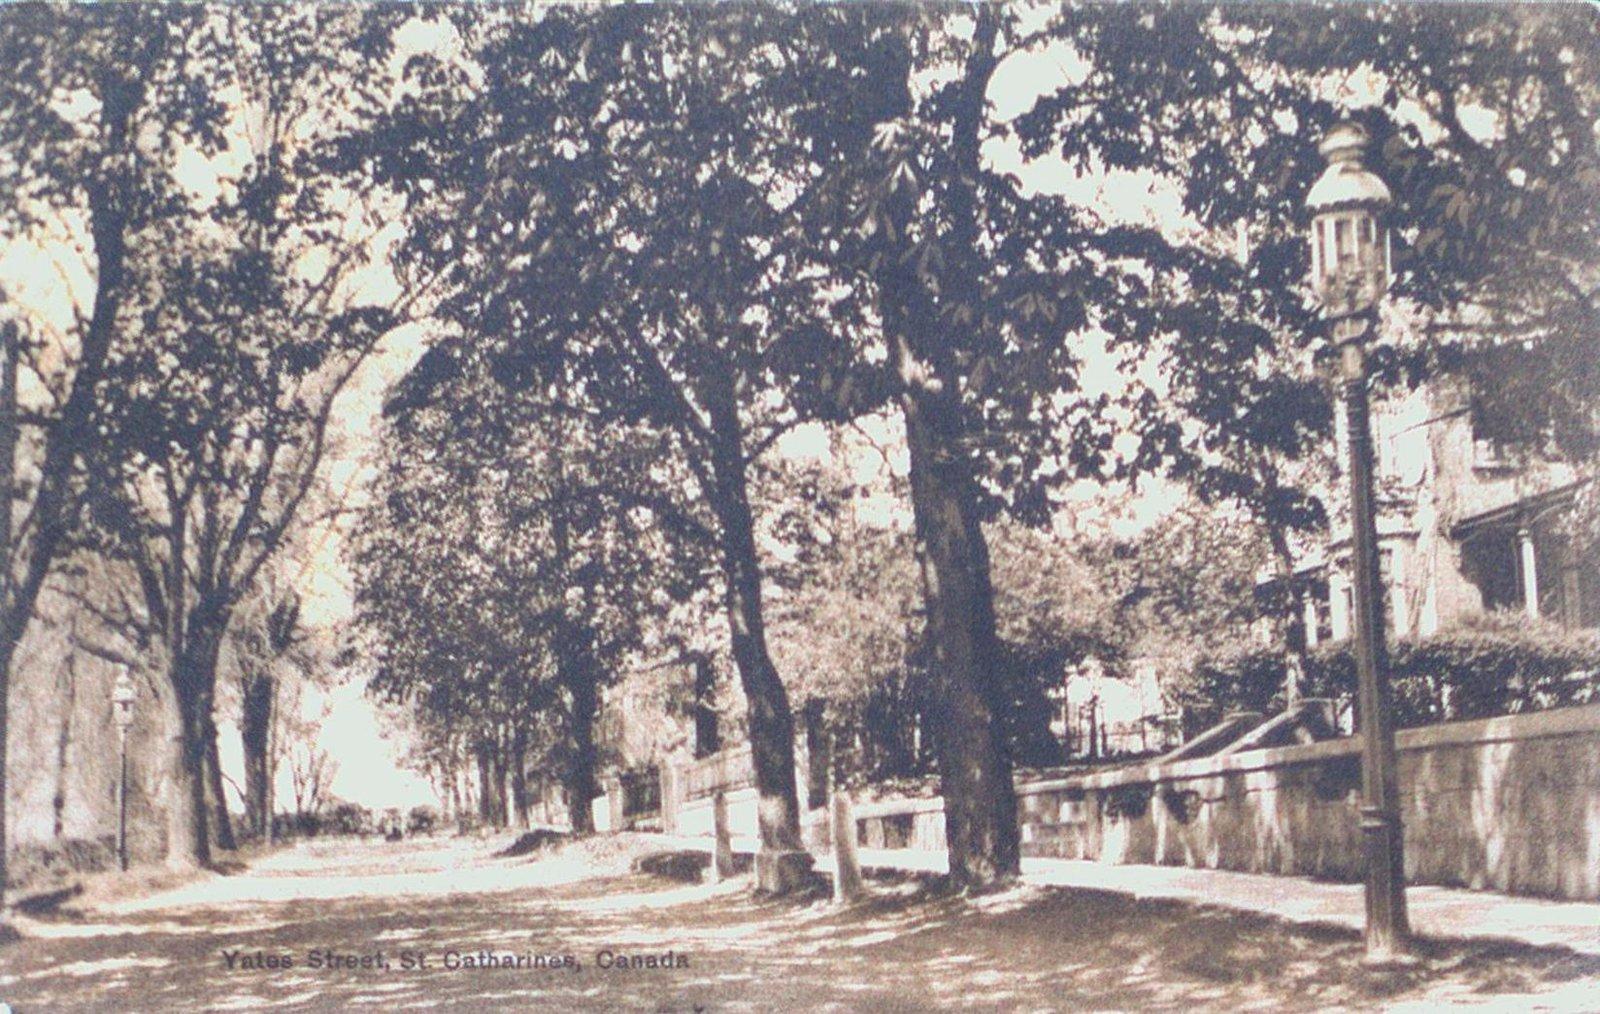 Yates Street, St. Catharines